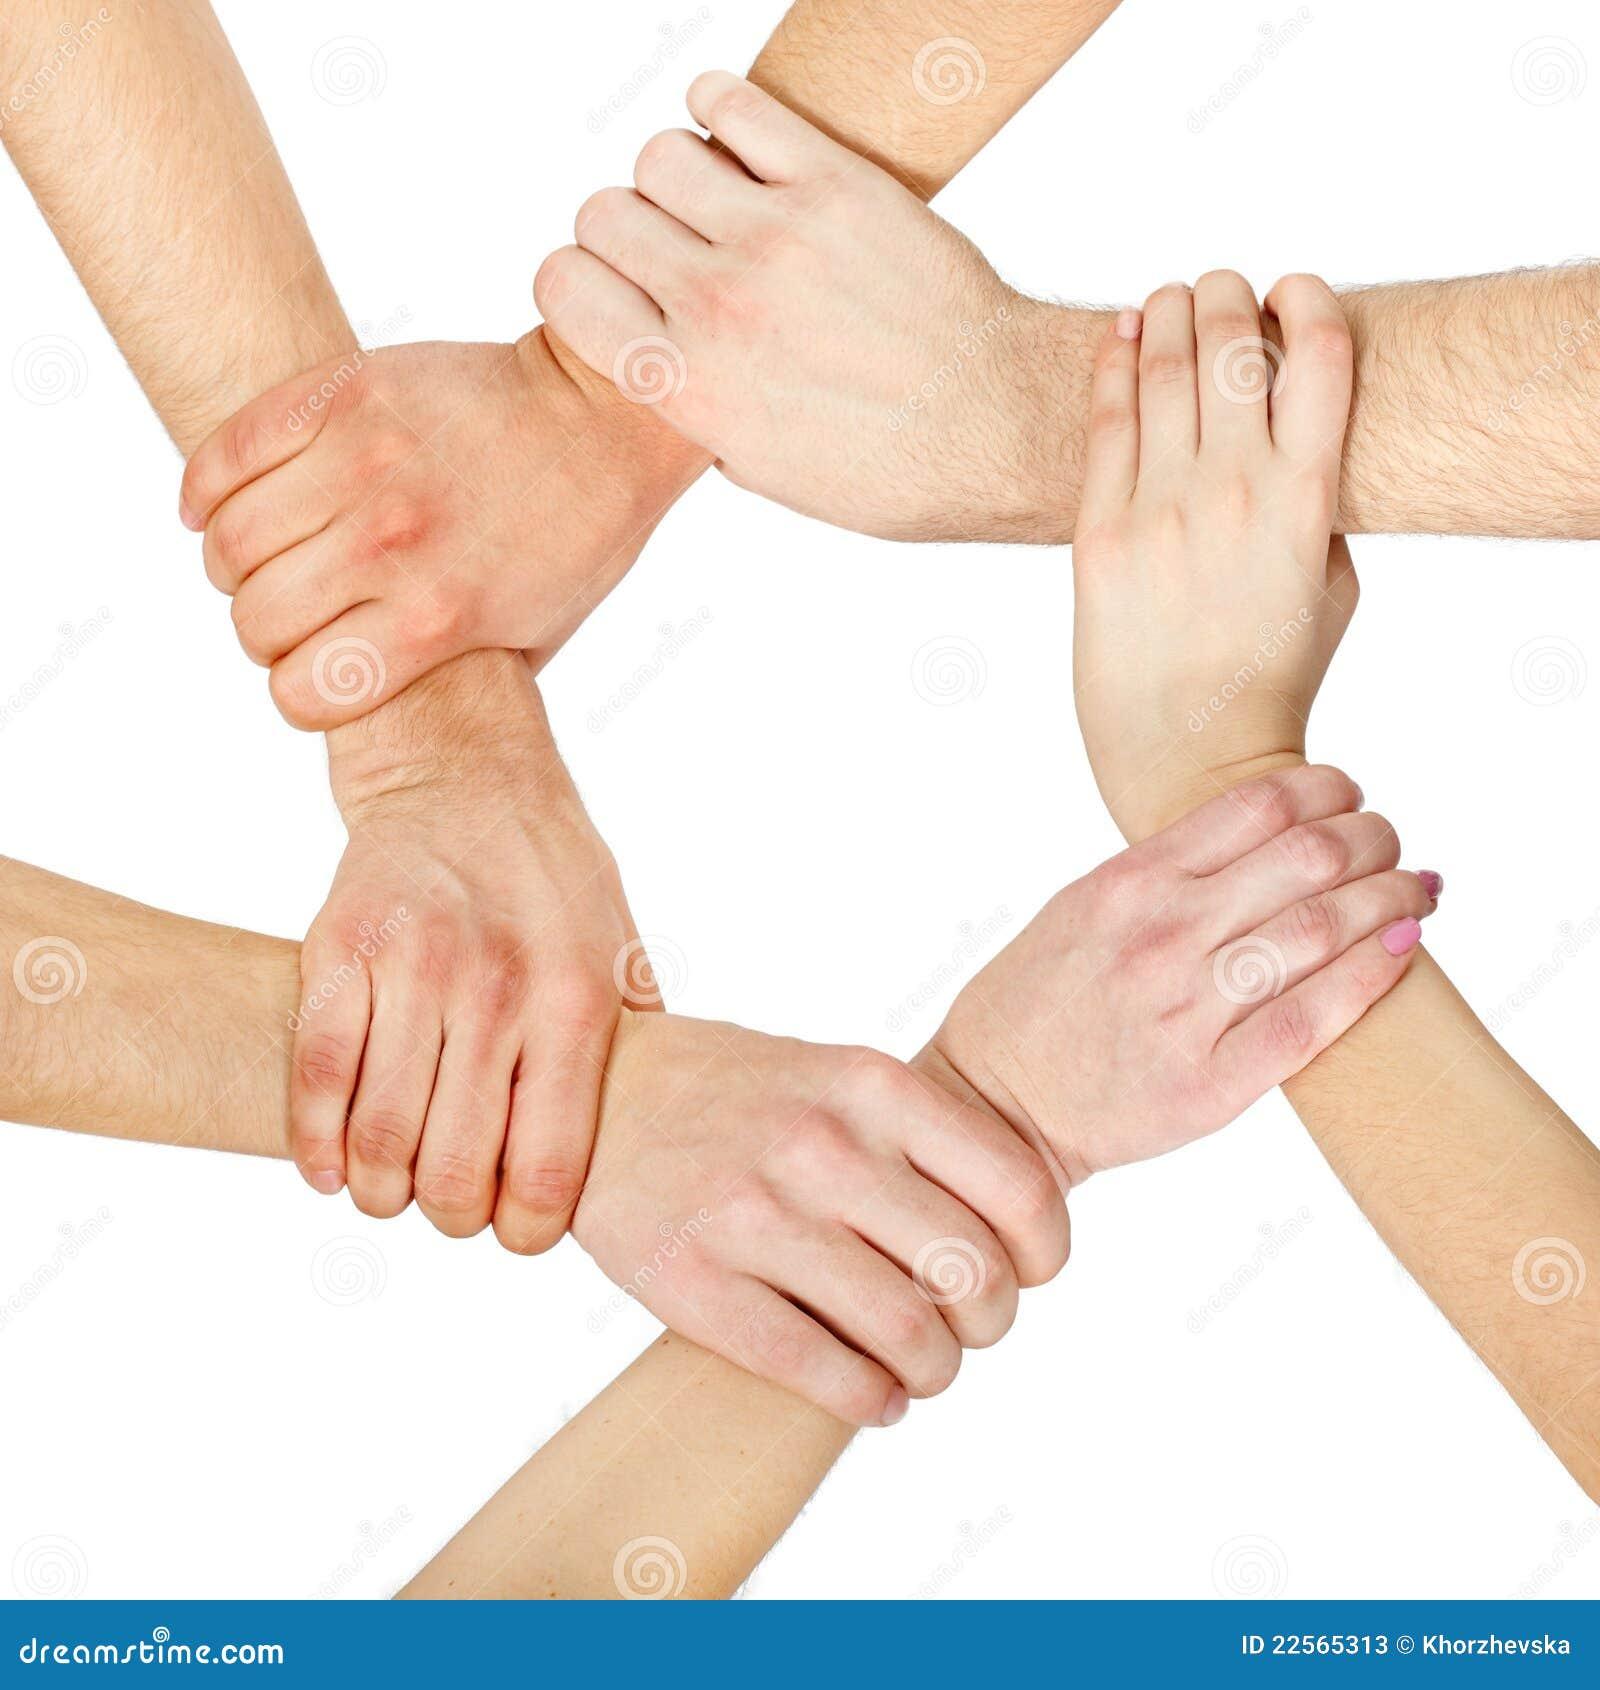 Hands Ring Teamwork Stock Photos - Image: 22565313